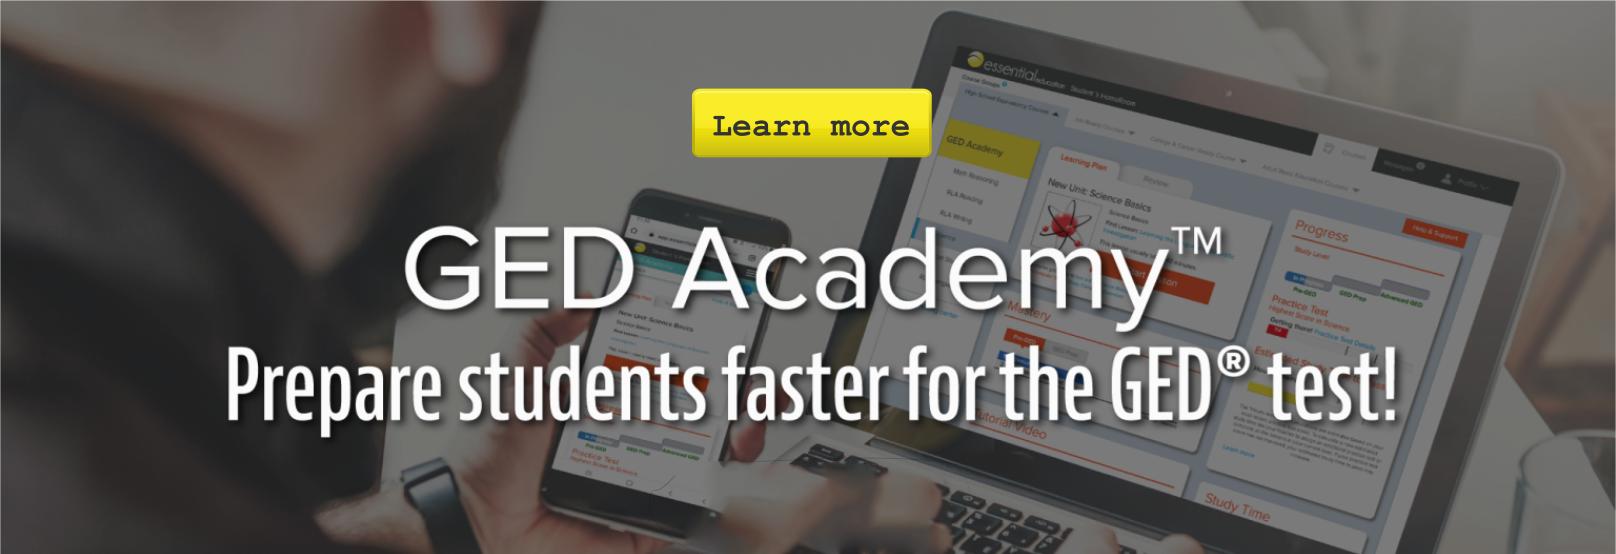 GED Academy